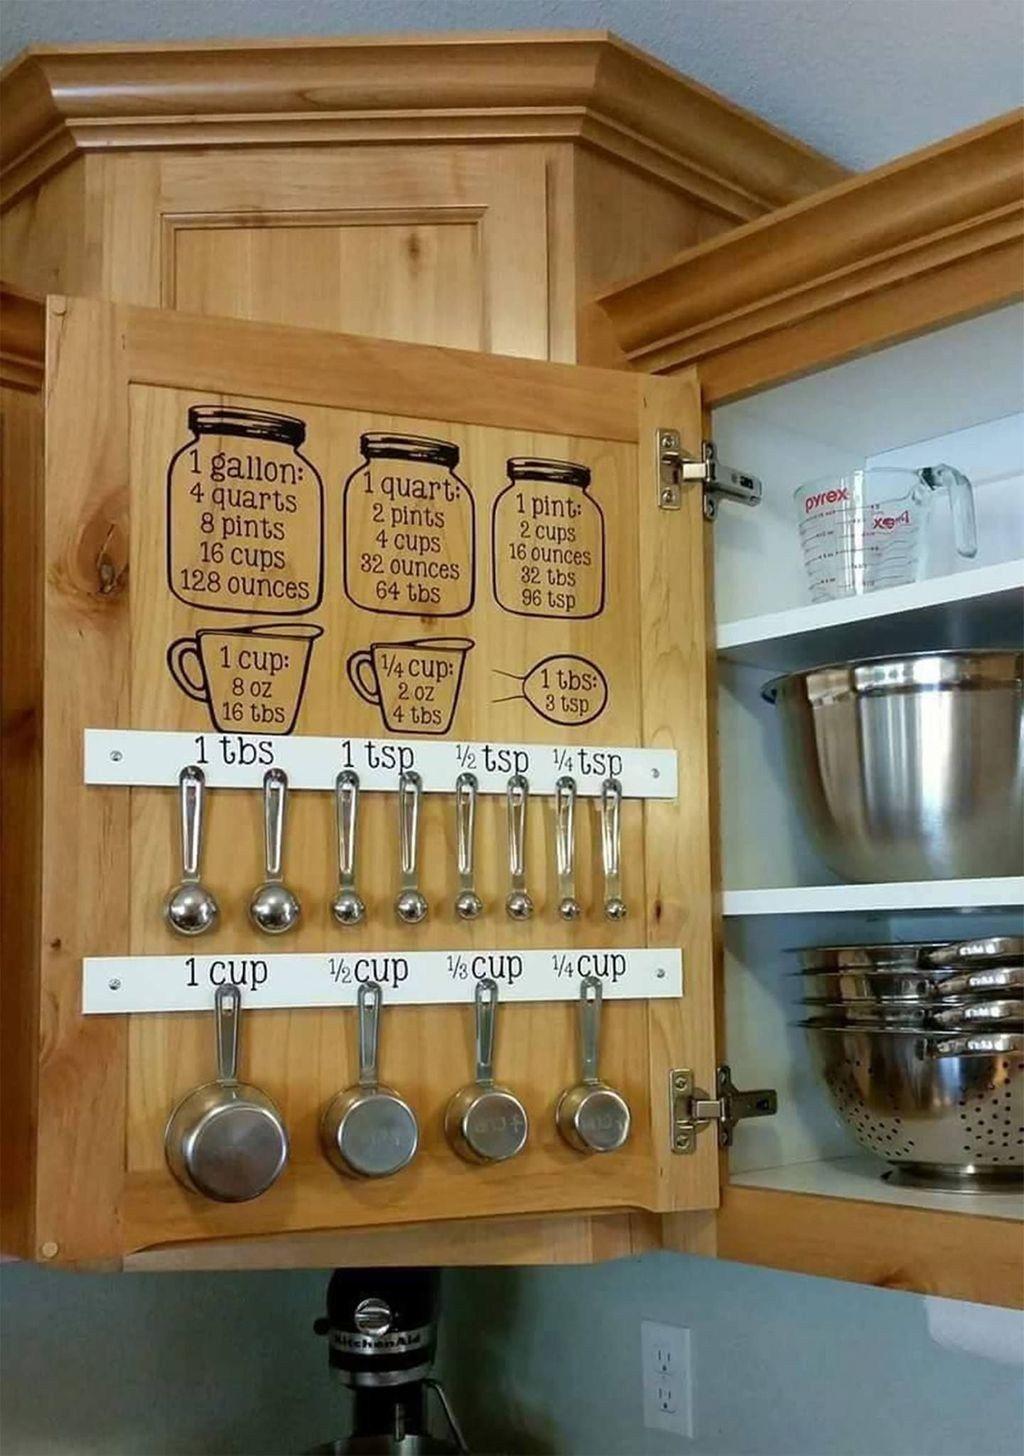 unimaginable diy ideas for kitchen storage 14 kitchen cupboard organization kitchen on kitchen organization diy id=62541